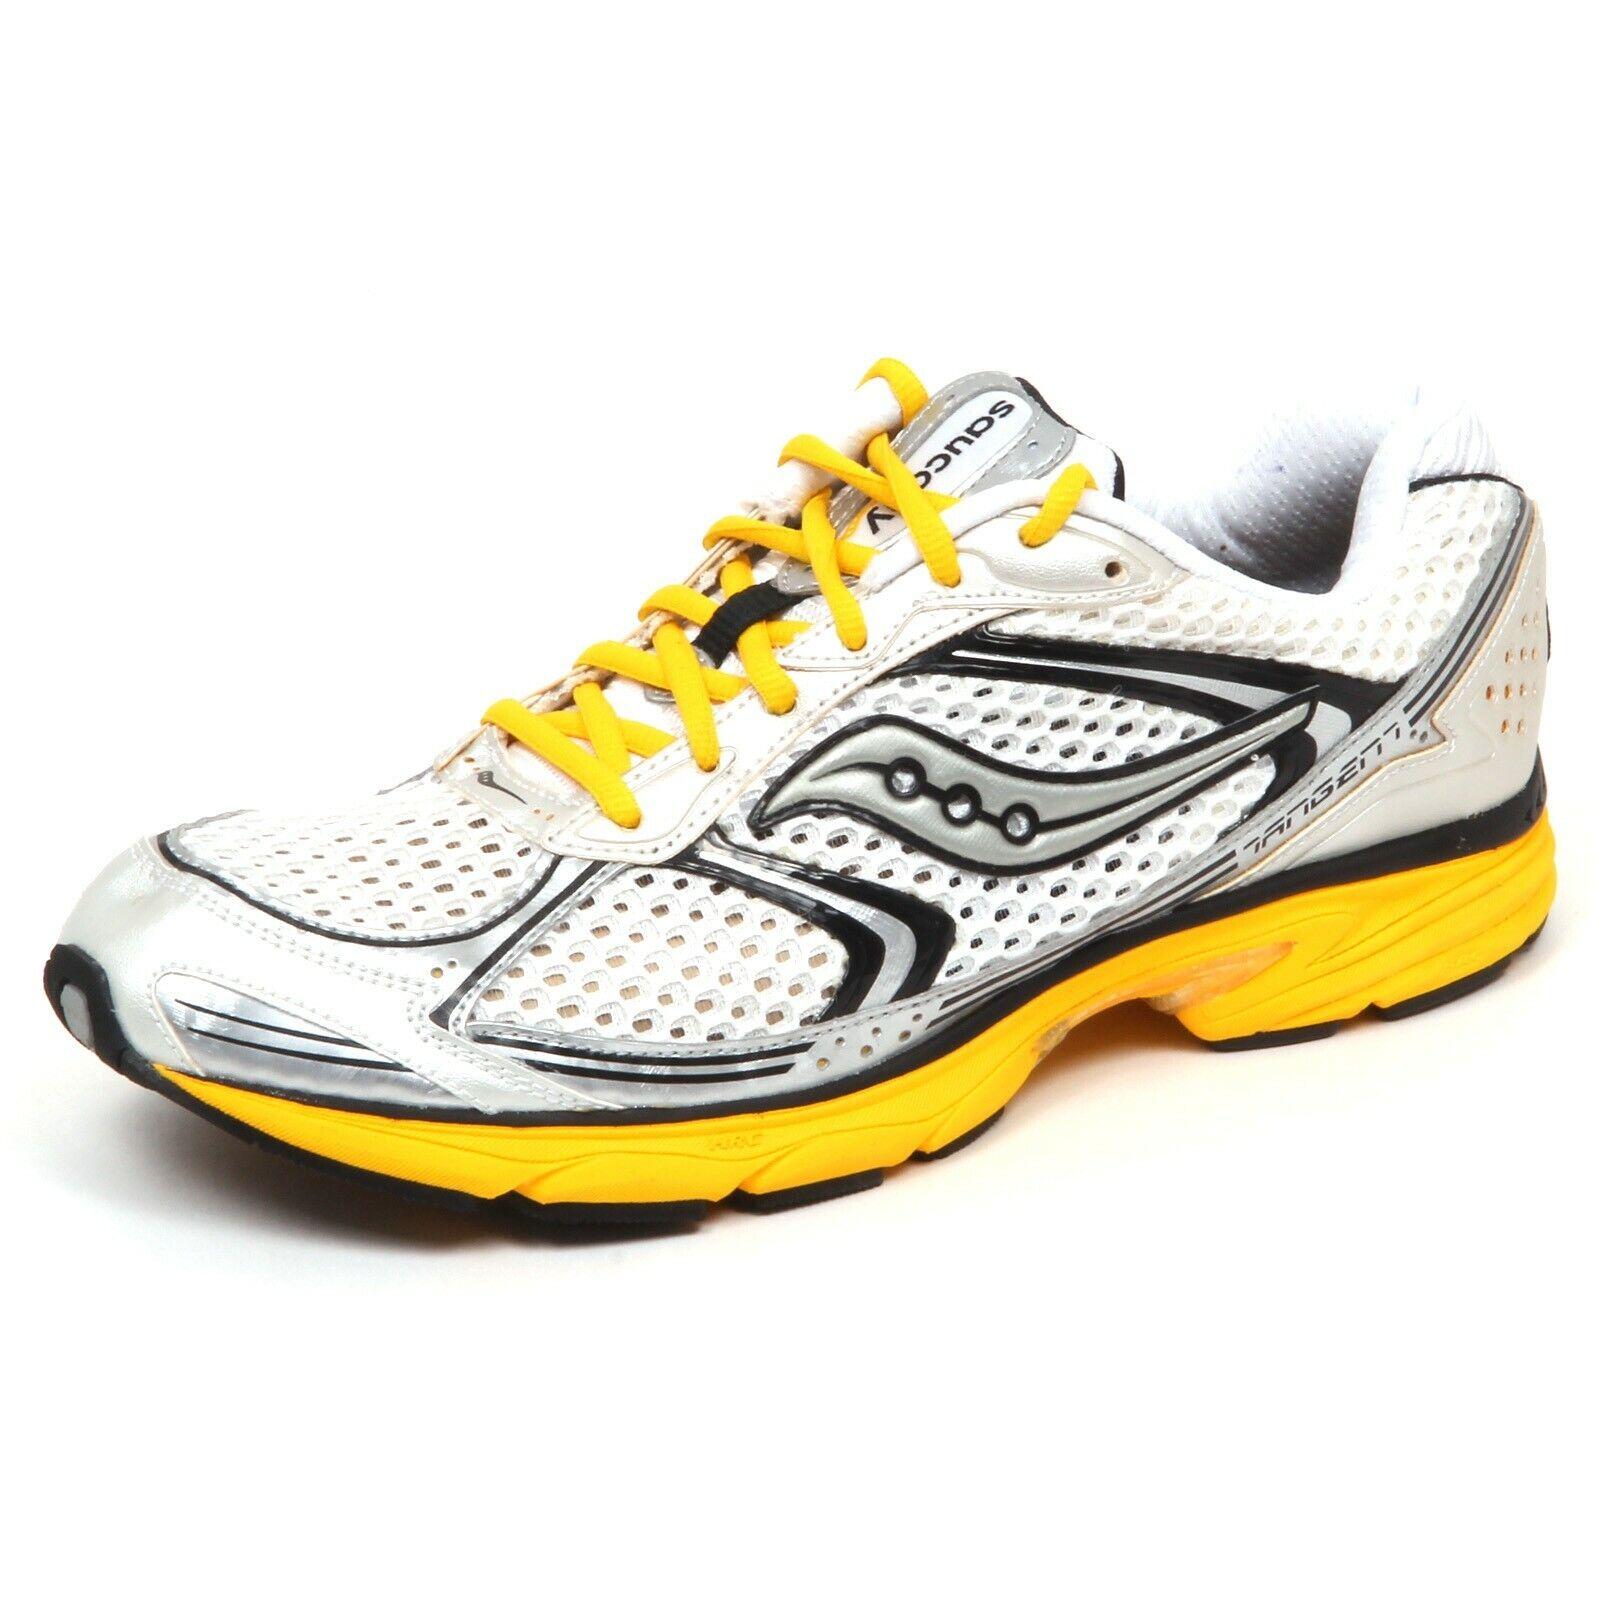 E5210 Zapatillas hombres SAUCONY GRID TANGENT 3 Zapatos de hombre